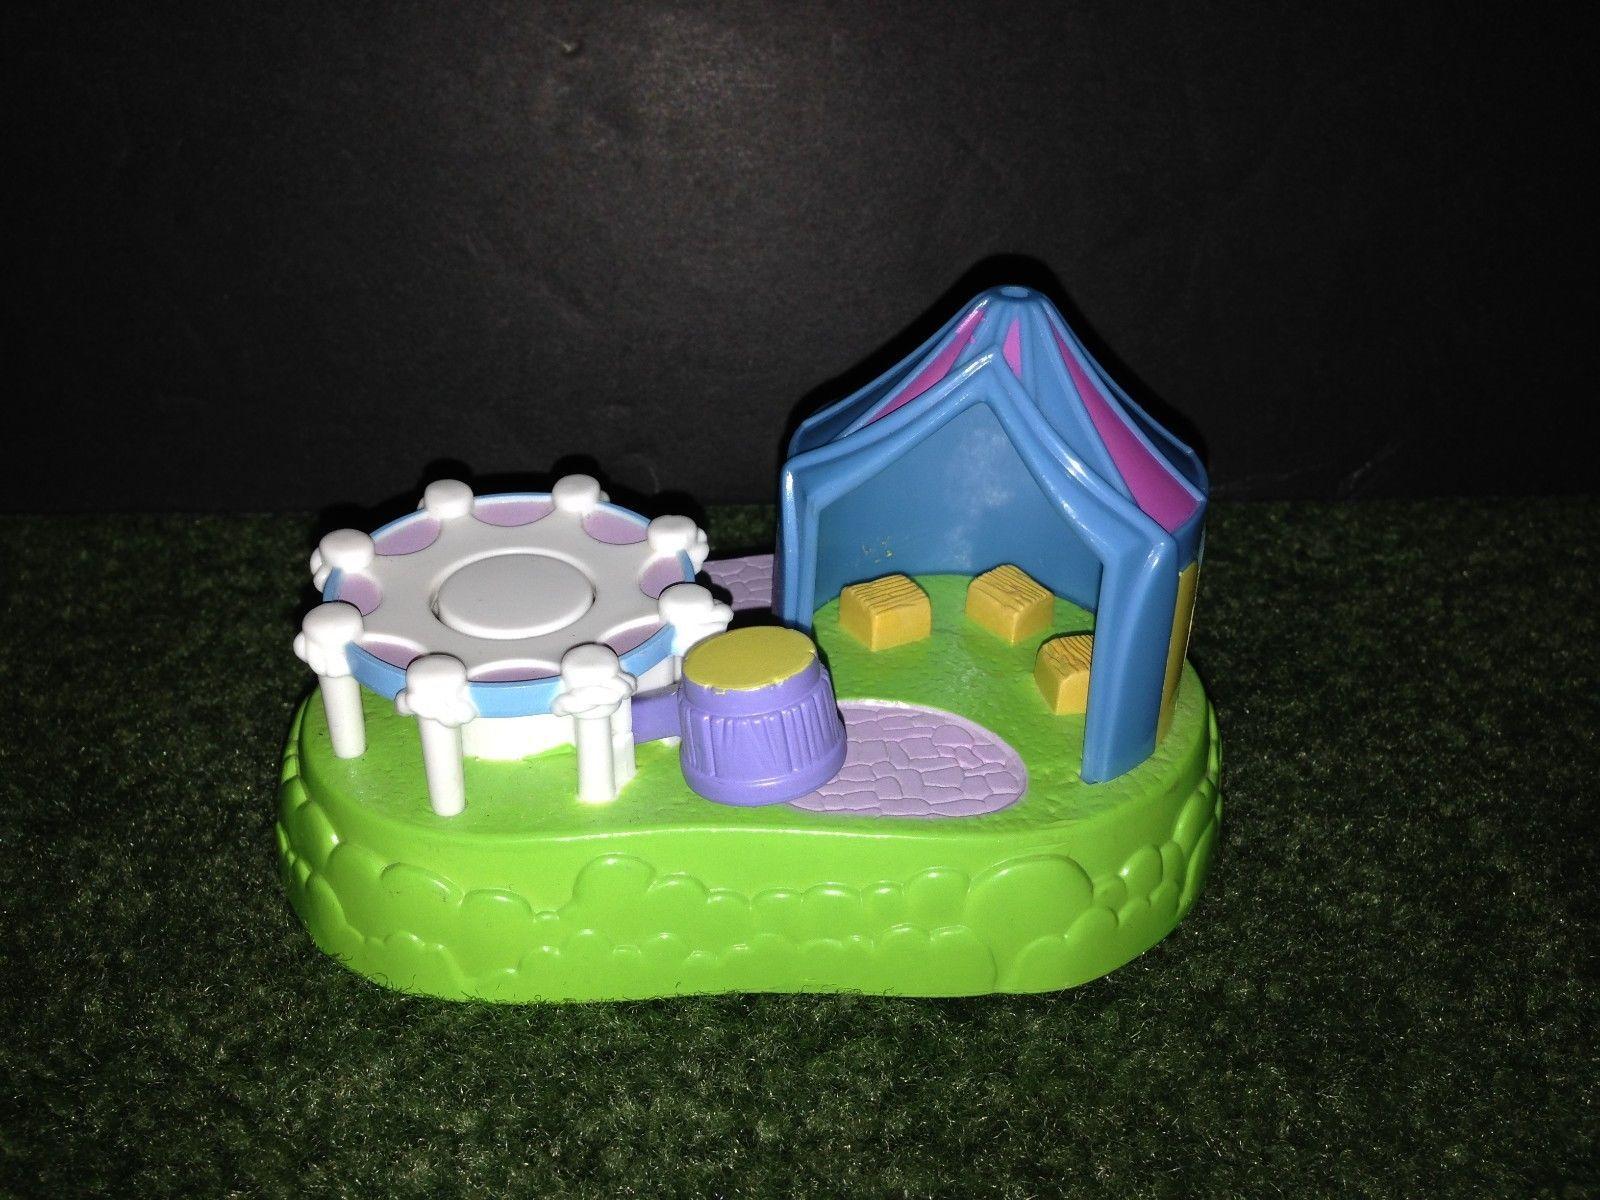 Polly Pocket Disney Magic Kingdom Castle Tent Ride Replacement | eBay & Polly Pocket Disney Magic Kingdom Castle Tent Ride Replacement ...